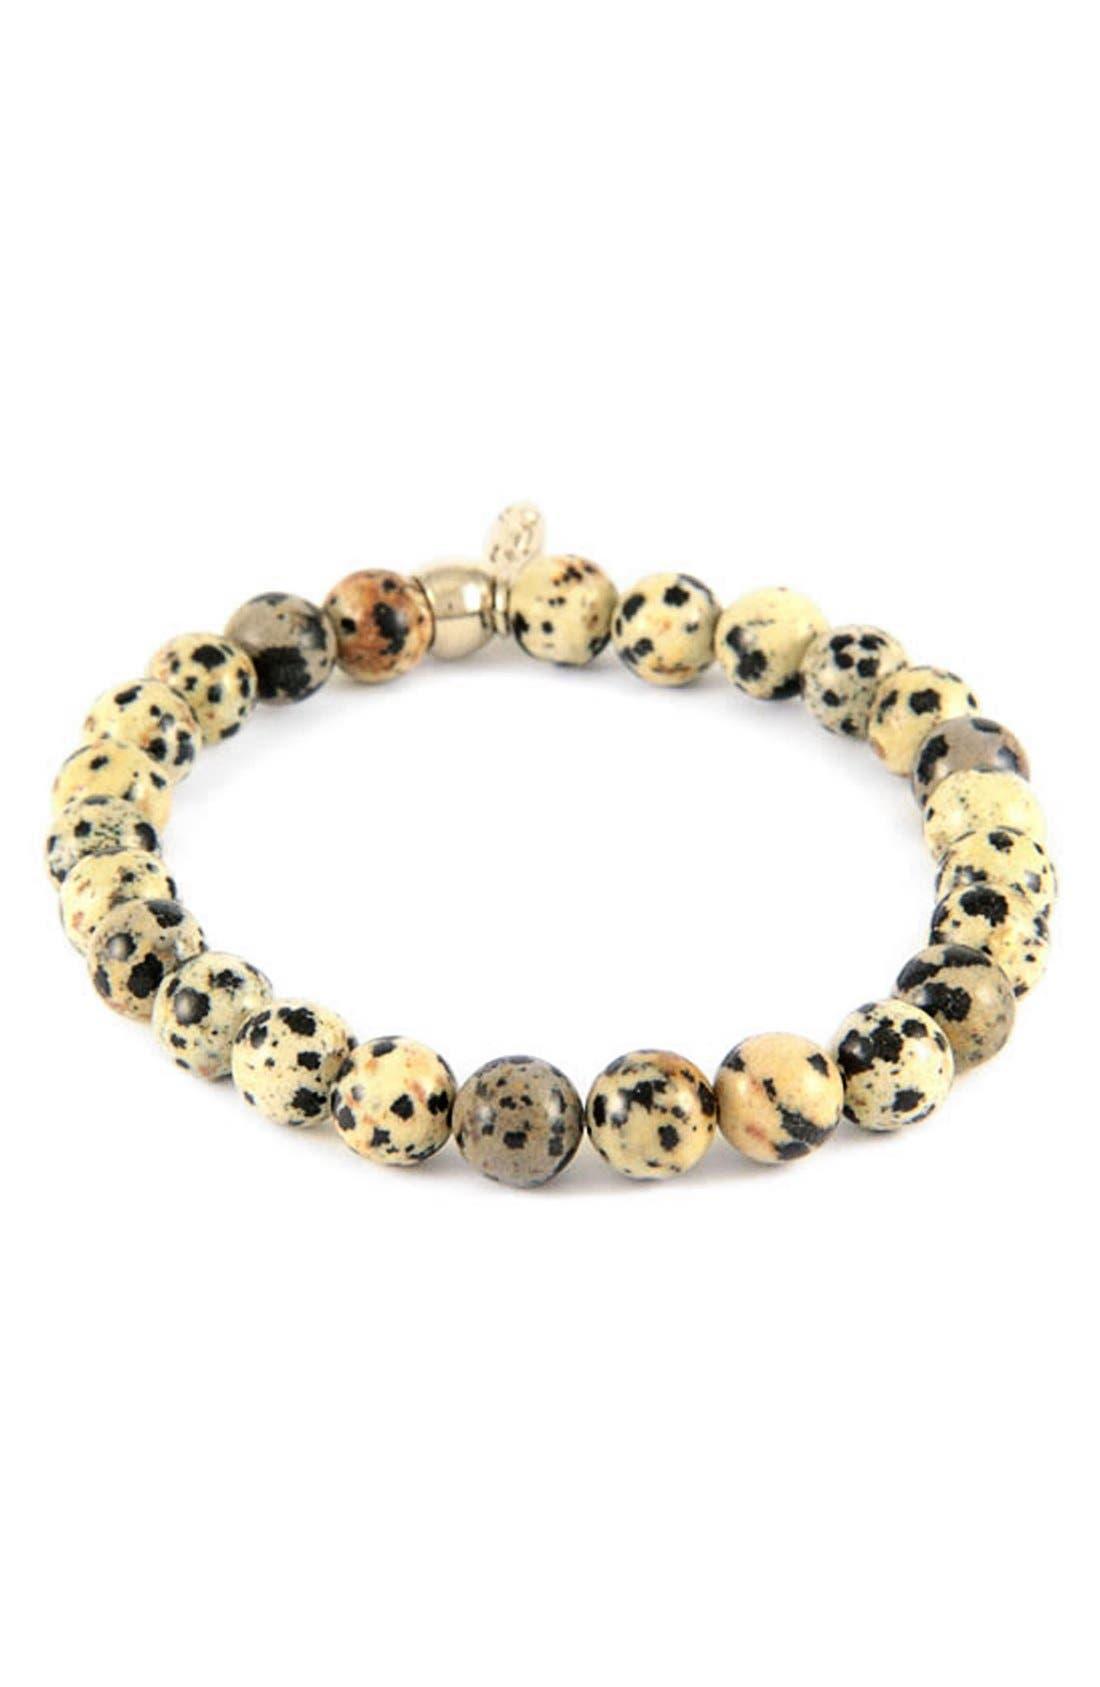 Alternate Image 1 Selected - Mr. Ettika Dalmatian Jasper Bead Bracelet